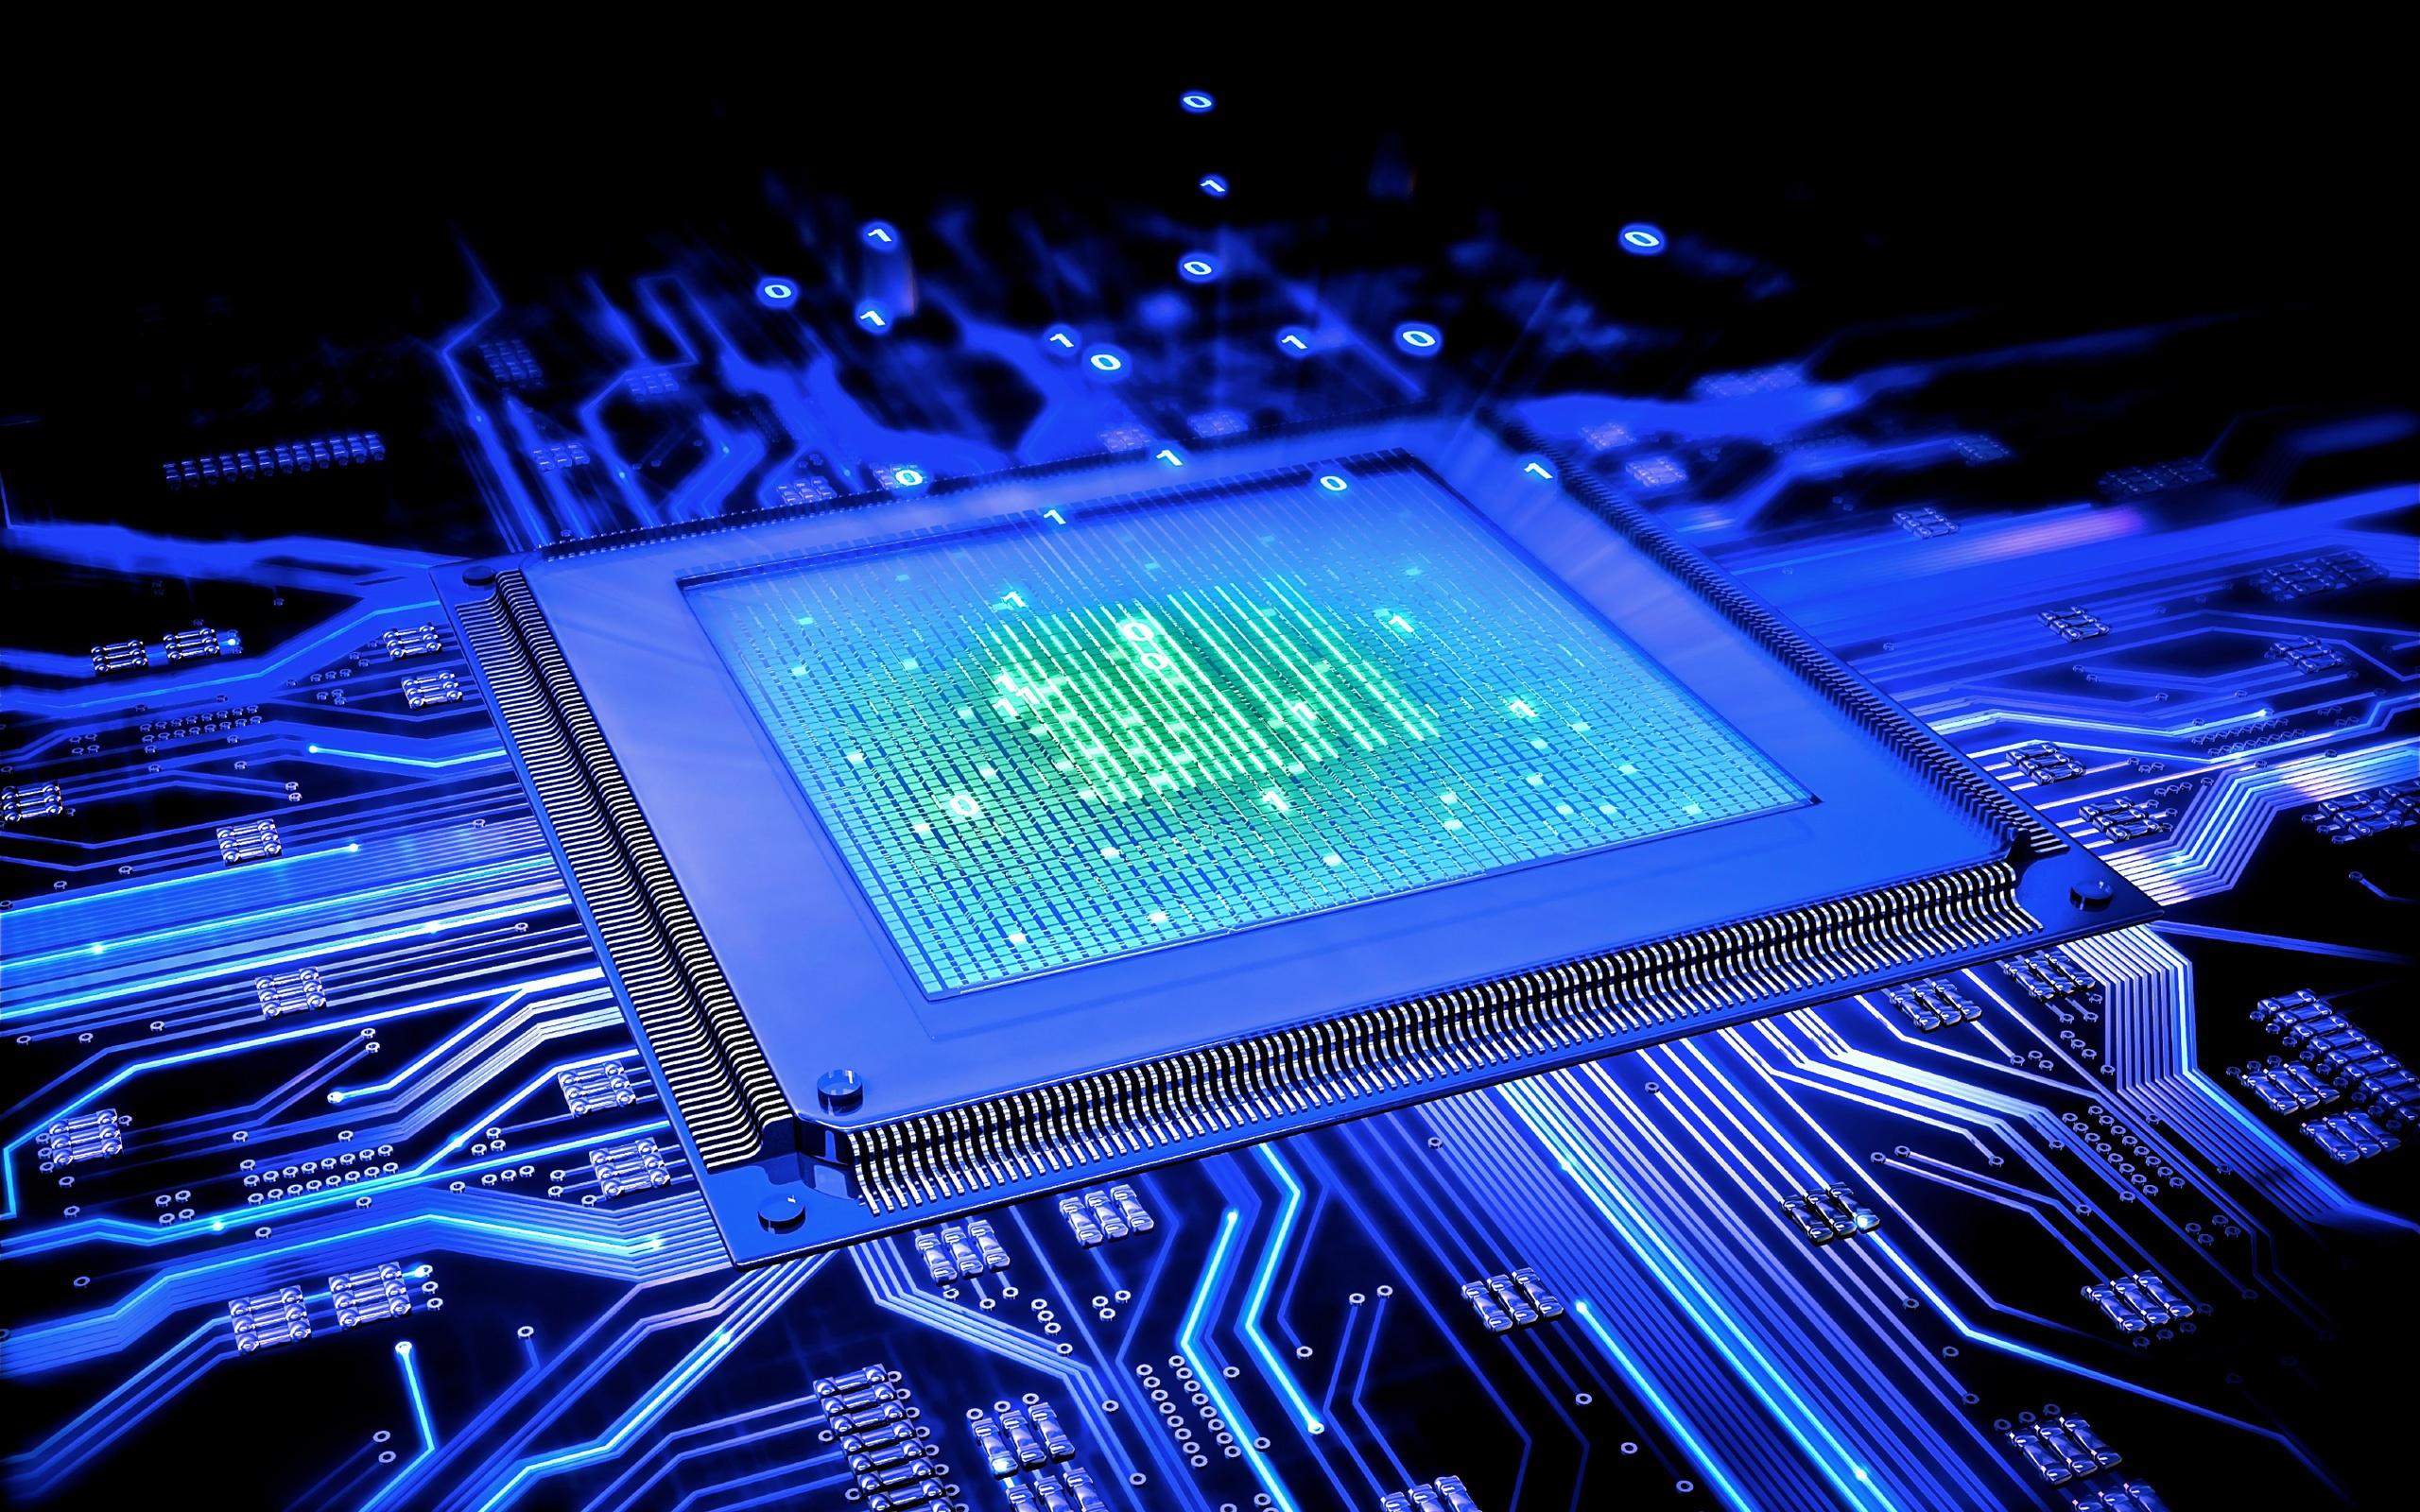 Blue Computer Cpu 2560 x 1600 2560x1600